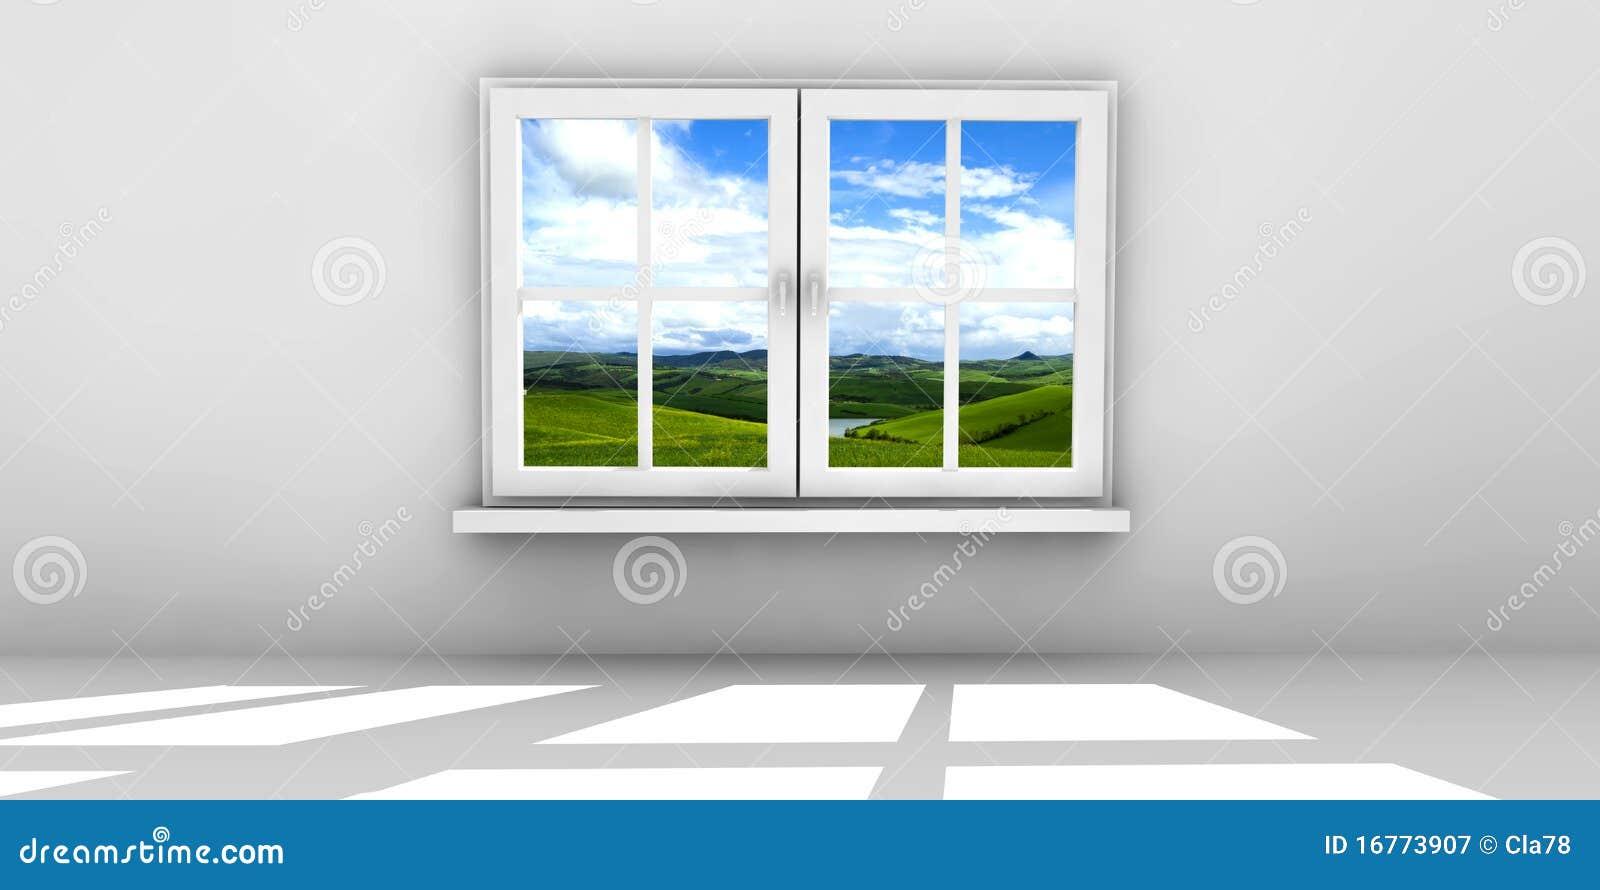 Fenster geschlossen clipart  Geschlossenes Fenster Stock Illustrationen, Vektors, & Klipart ...